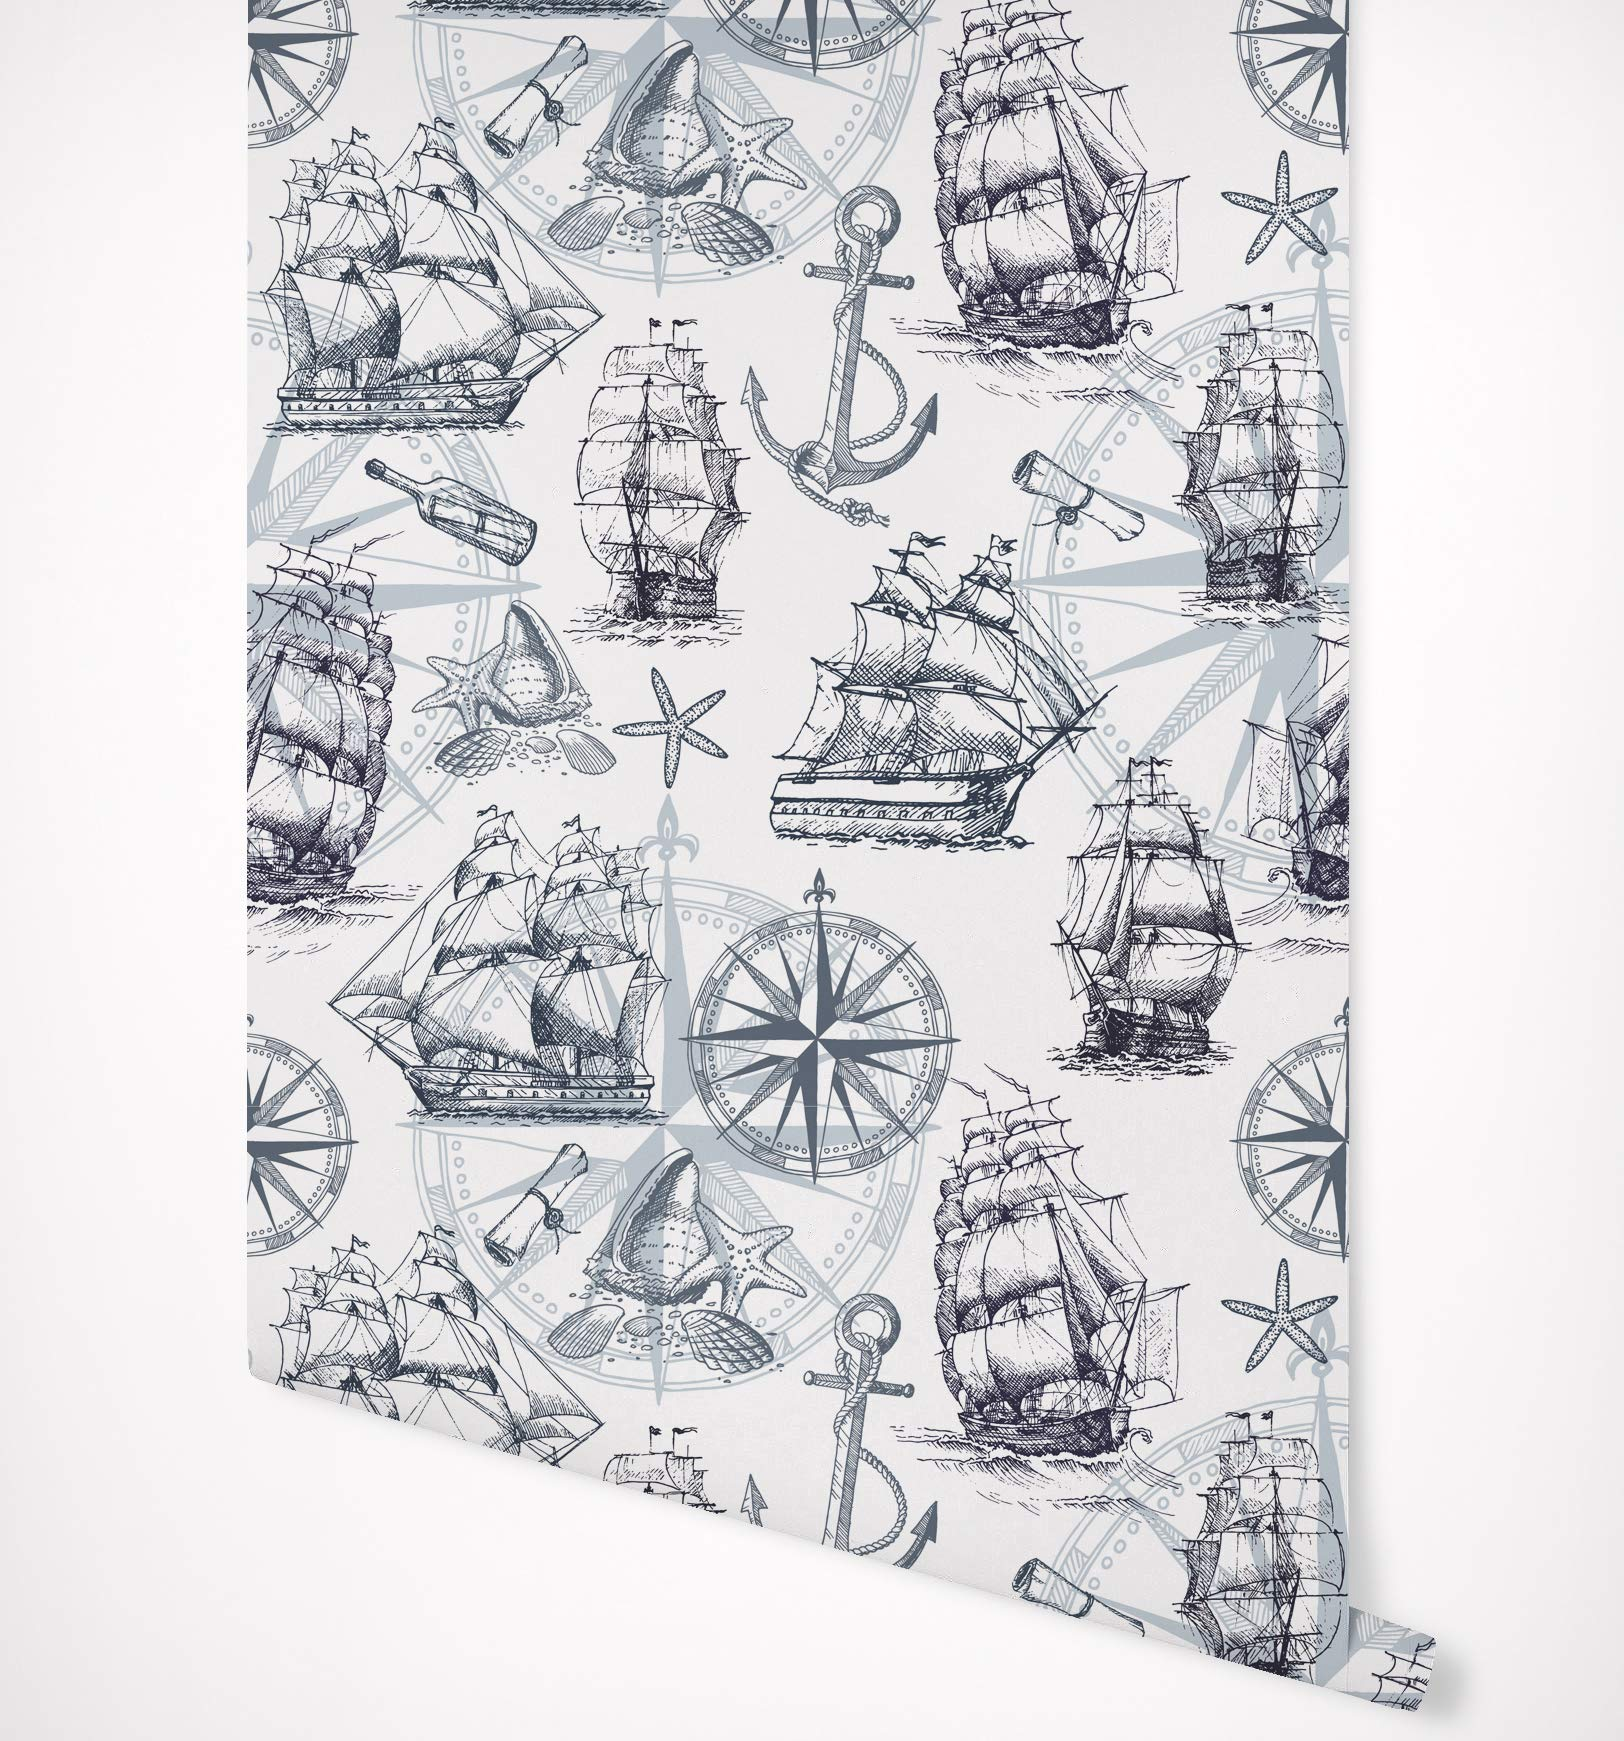 Kraska Peel and Stick Wallpaper Nautical Marine Ship Compass Anchor, Removable Wallpaper Self Adhesive Premium Quality Multi Purpose - Wall Decor for Home Nursery Kitchen Bathroom Office - 24'' x 96''